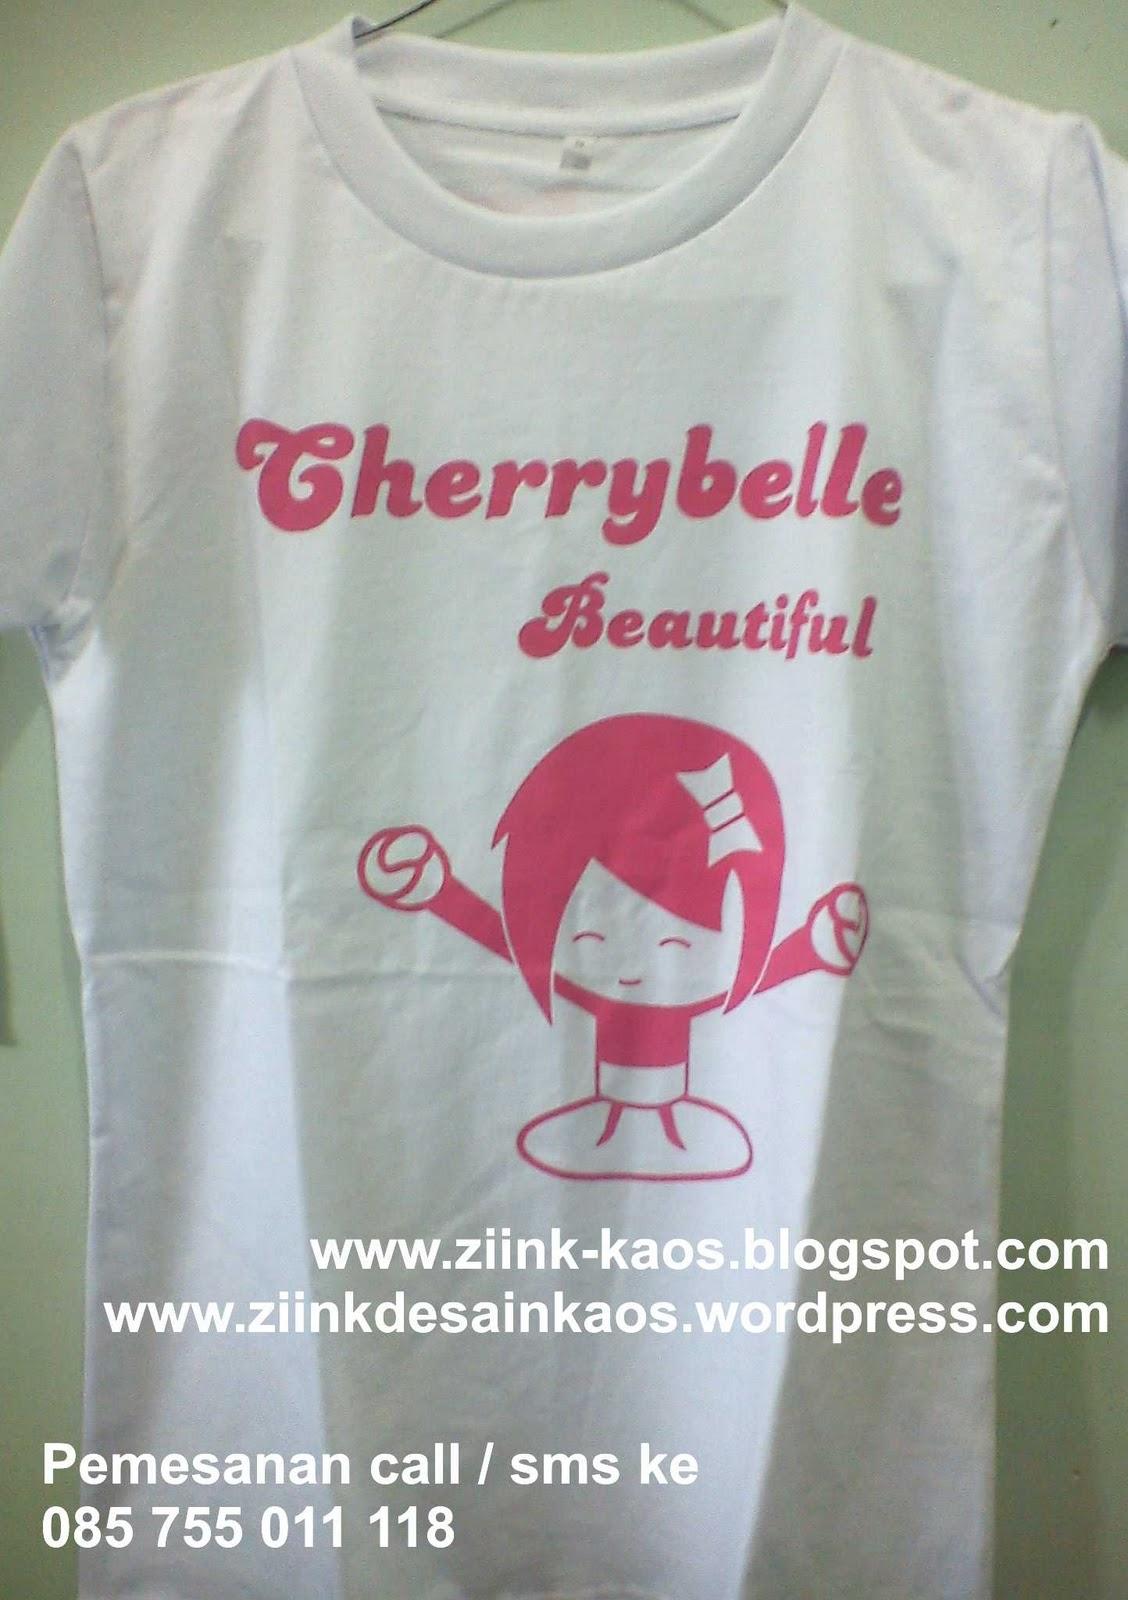 Ziink Kaos Online Kaos Lucu Cherry Belle ChiBi Kaos Online